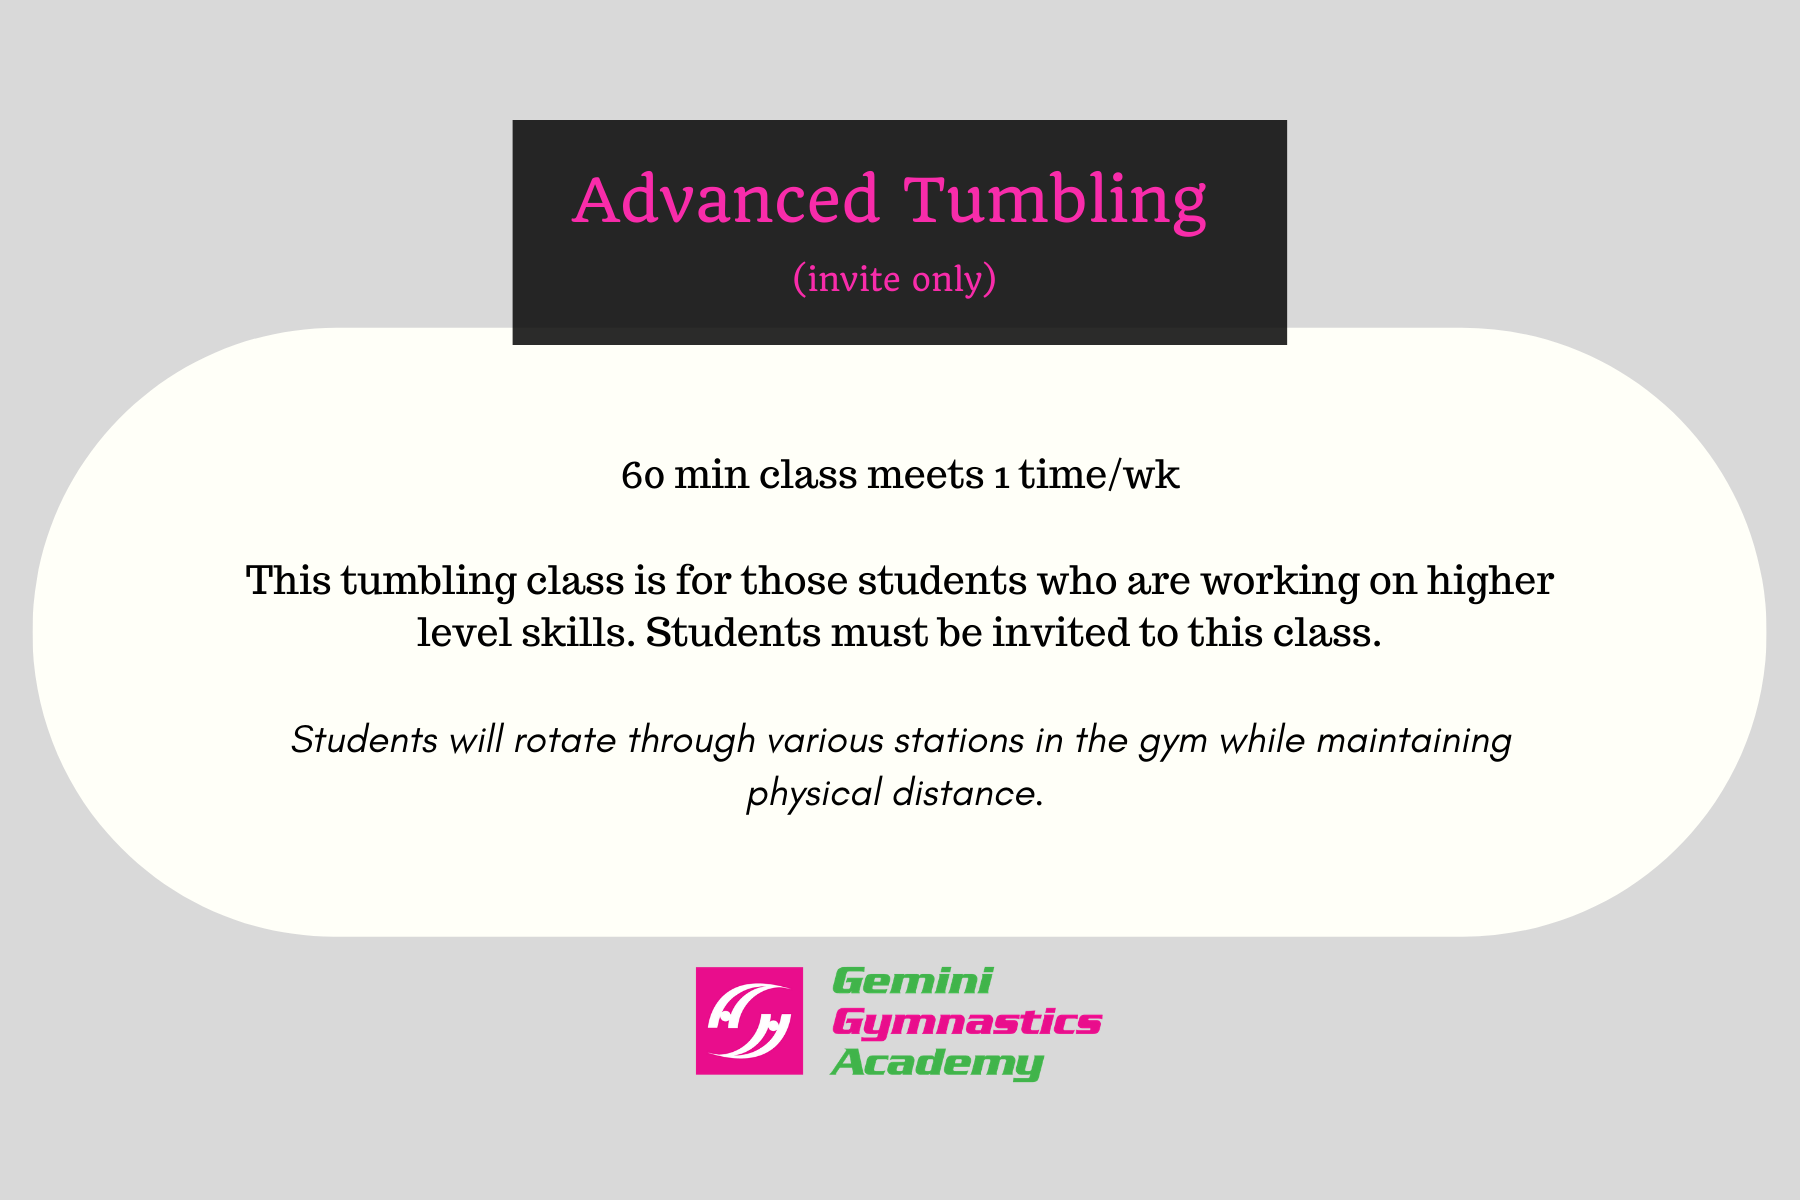 Advanced Tumbling